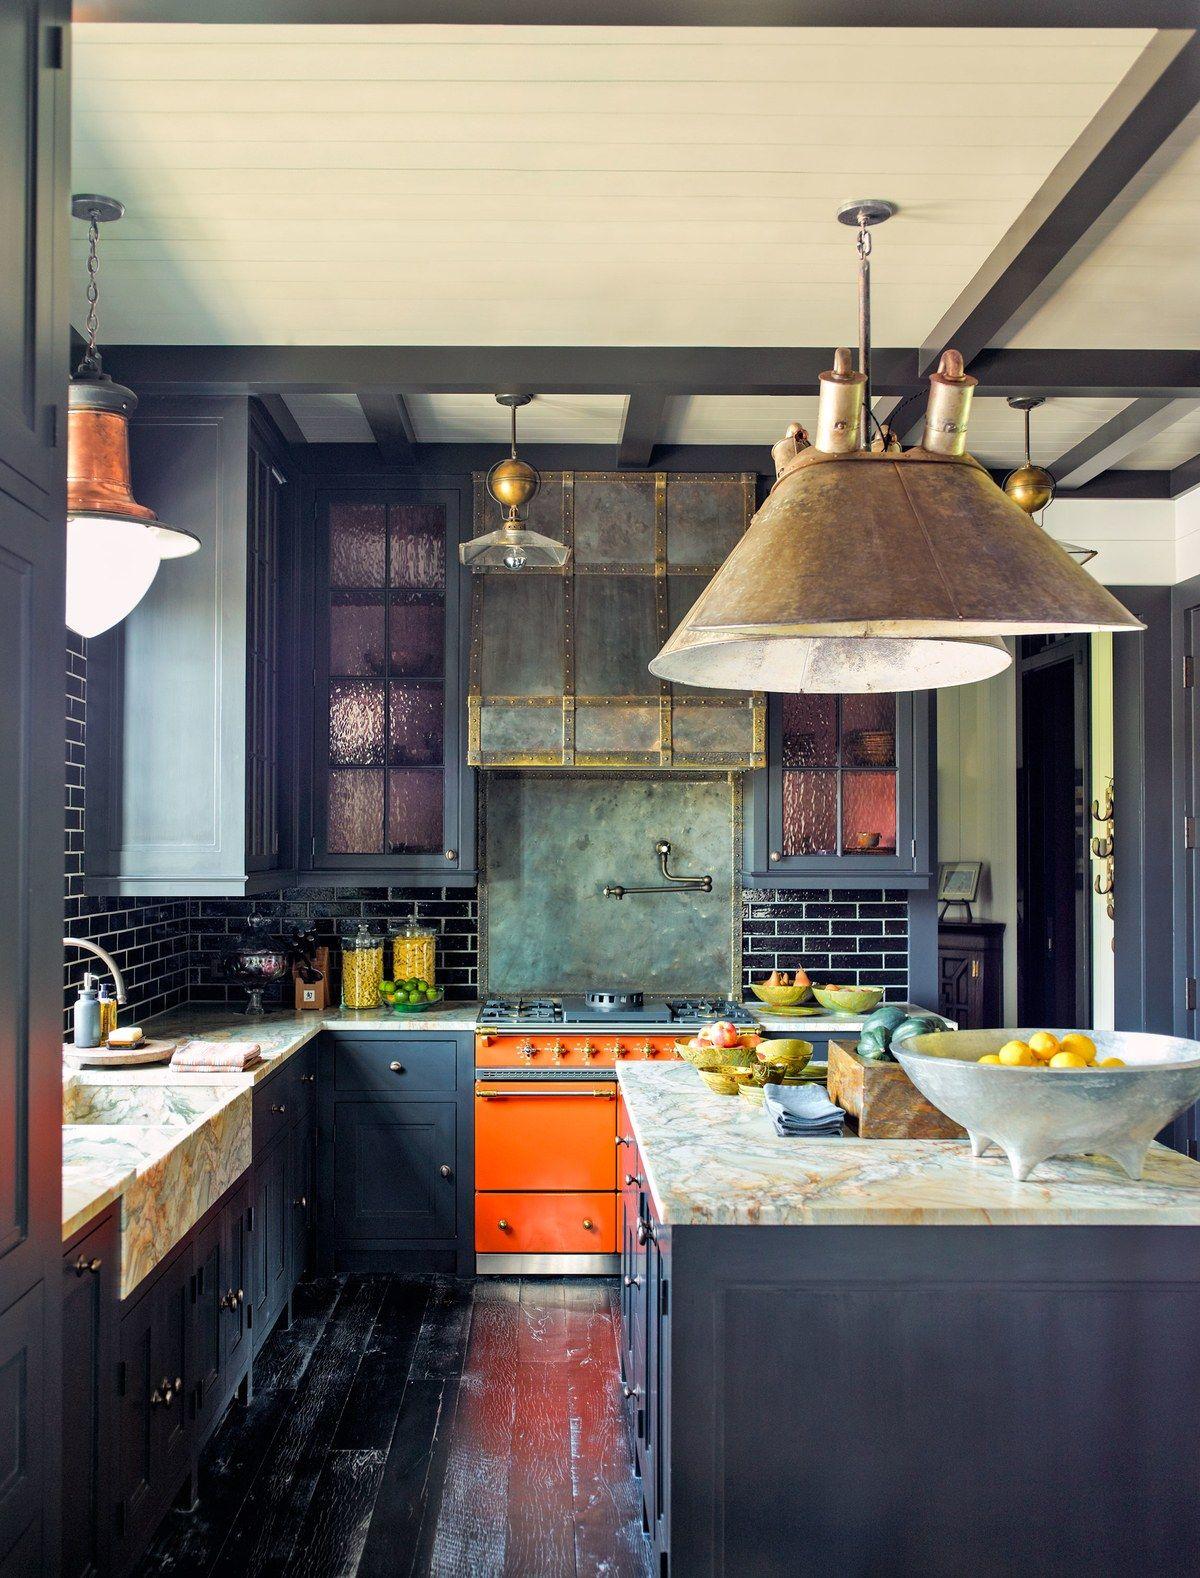 Planning a renovation? Renowned New York designer Steven Gambrel ...